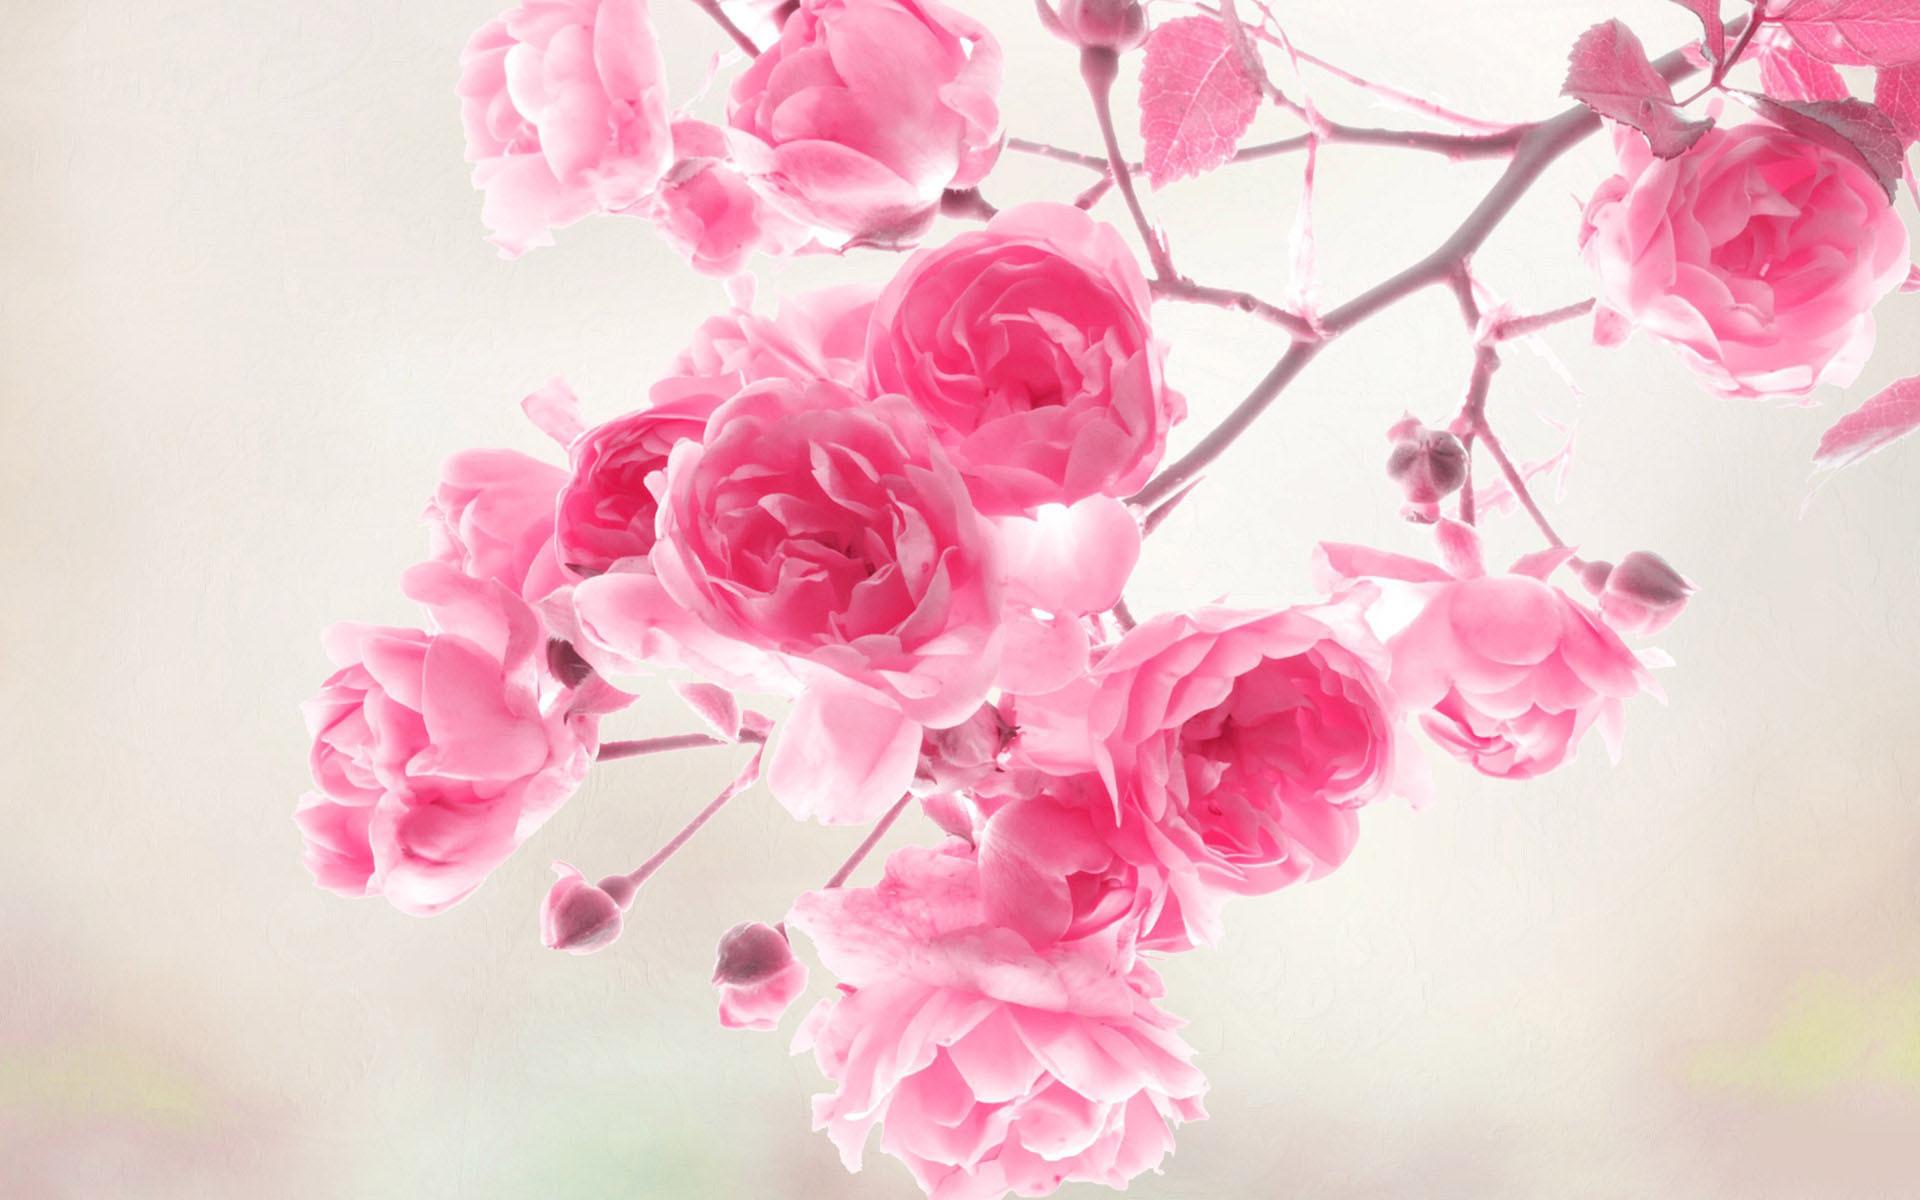 40 Beautiful Flower Wallpapers for your desktop